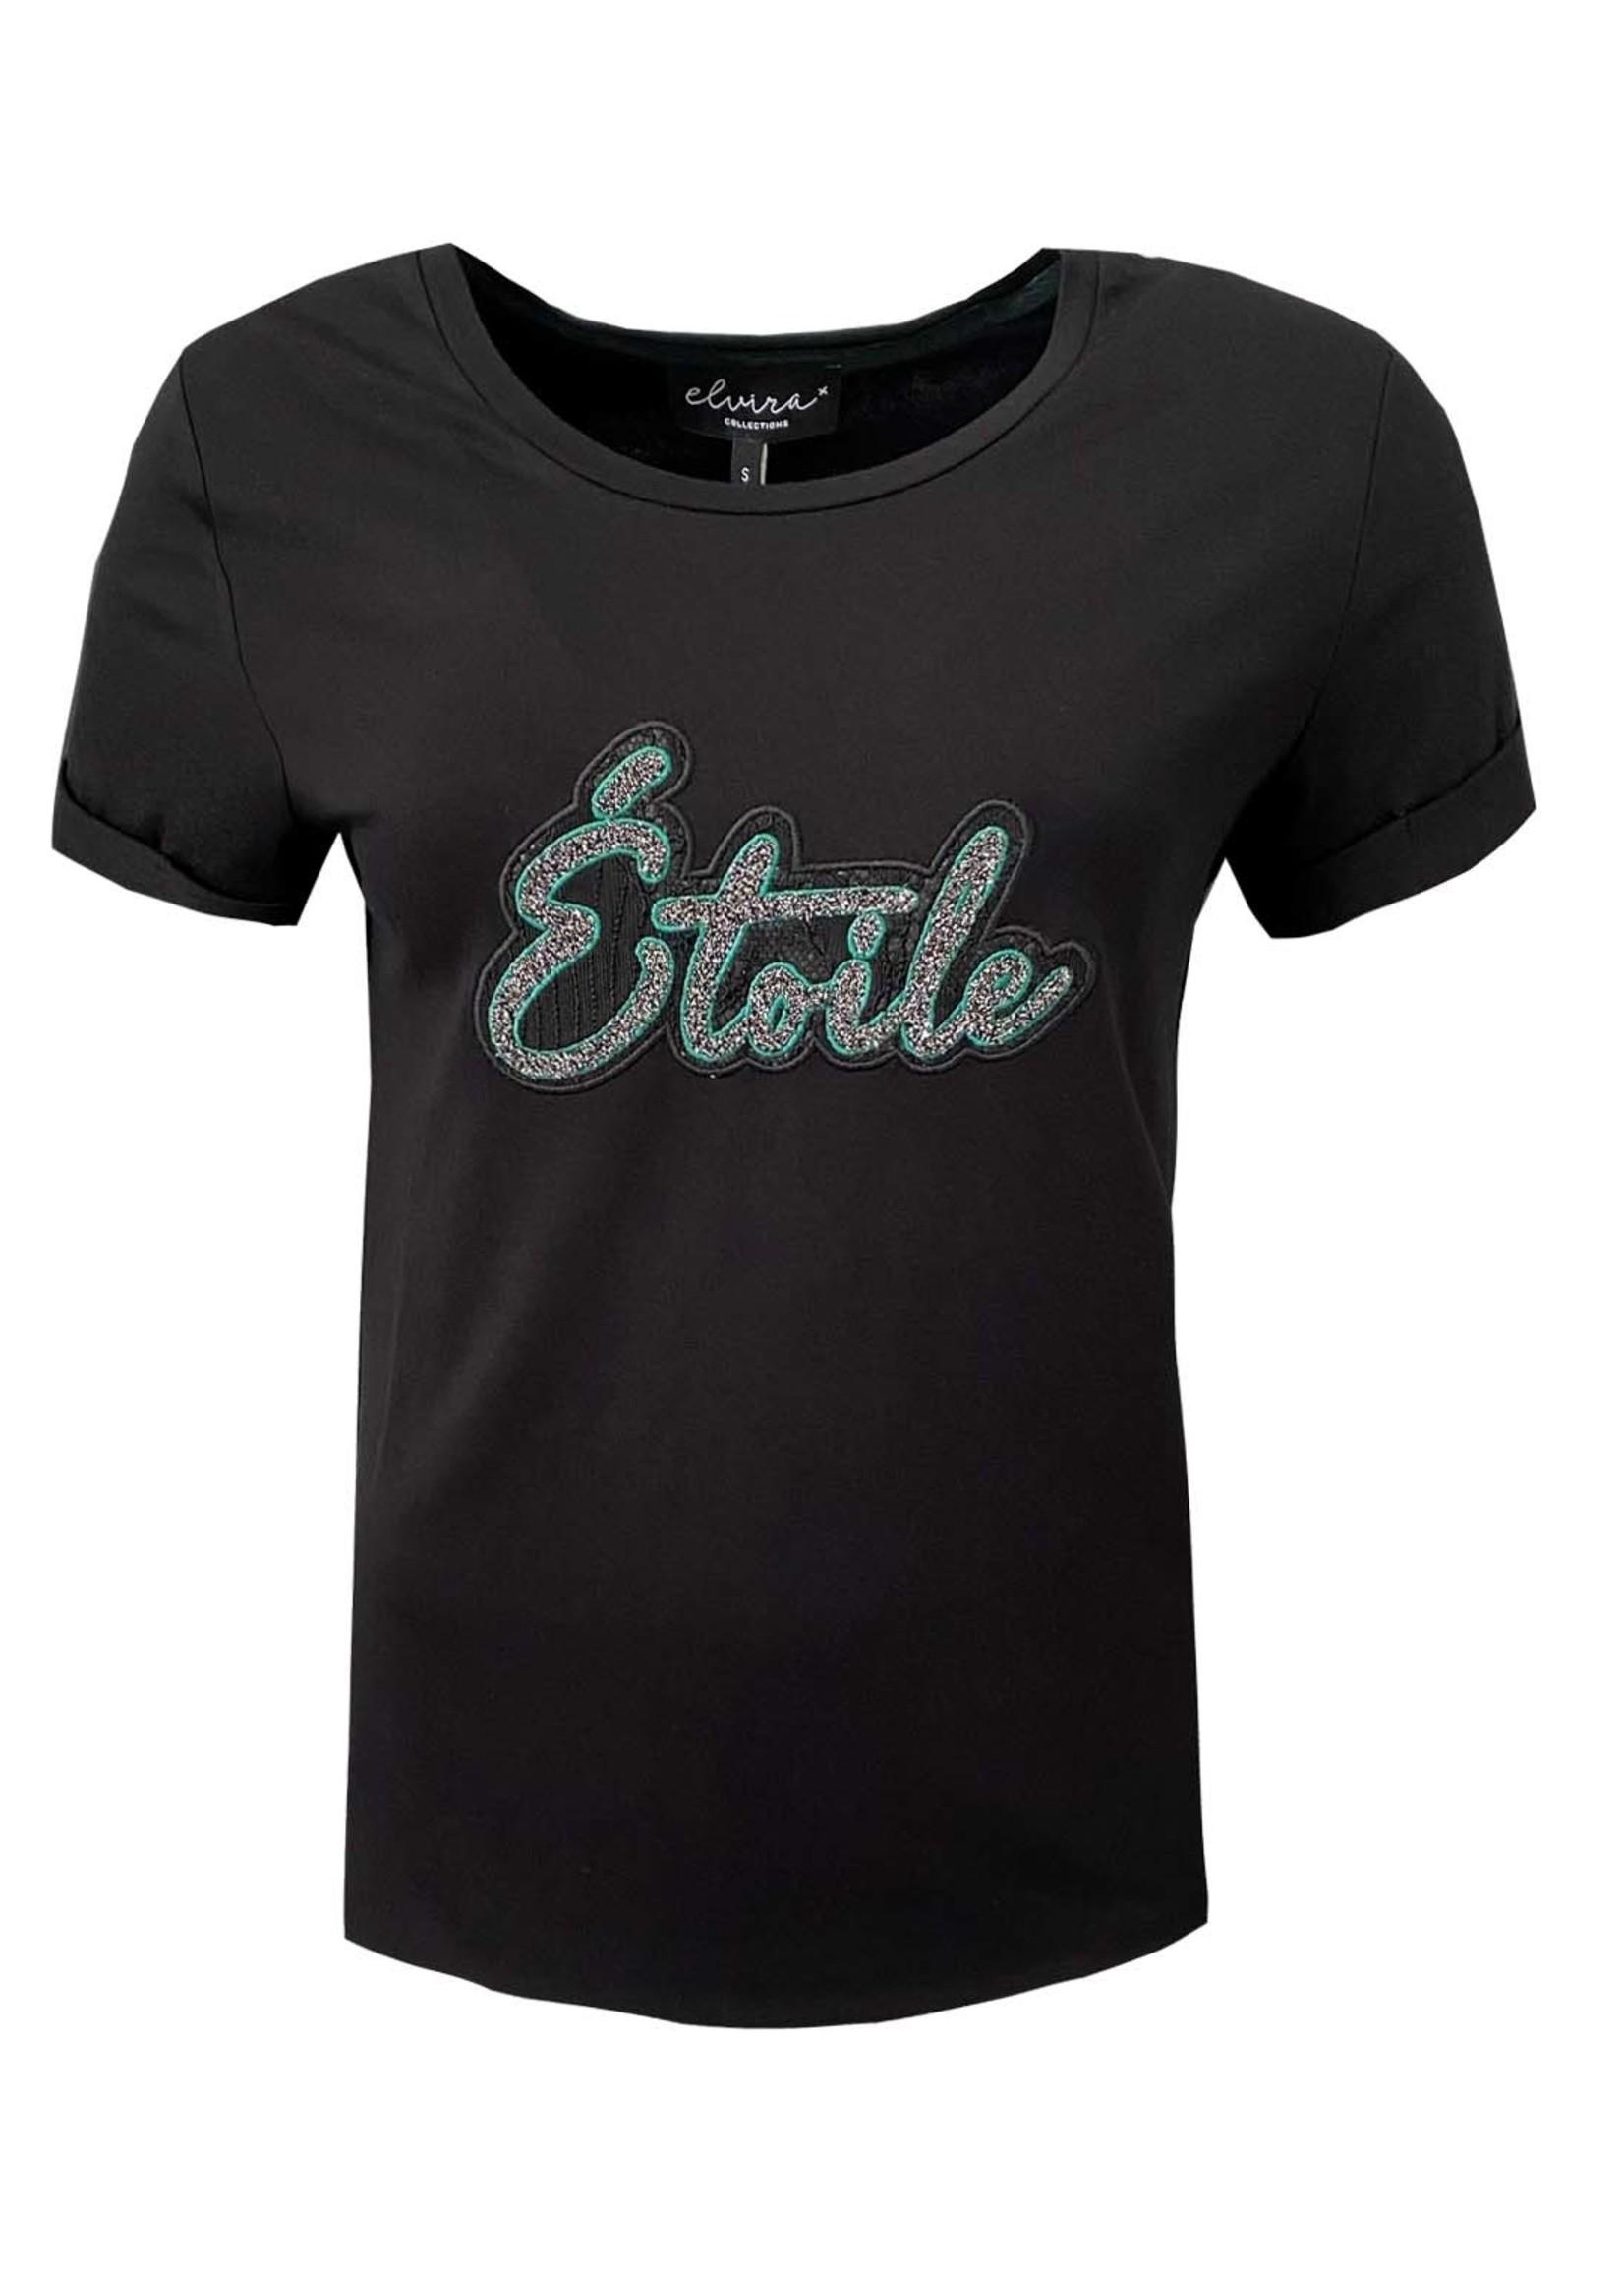 Elvira Collections Elvira Collections Etoile T-shirt